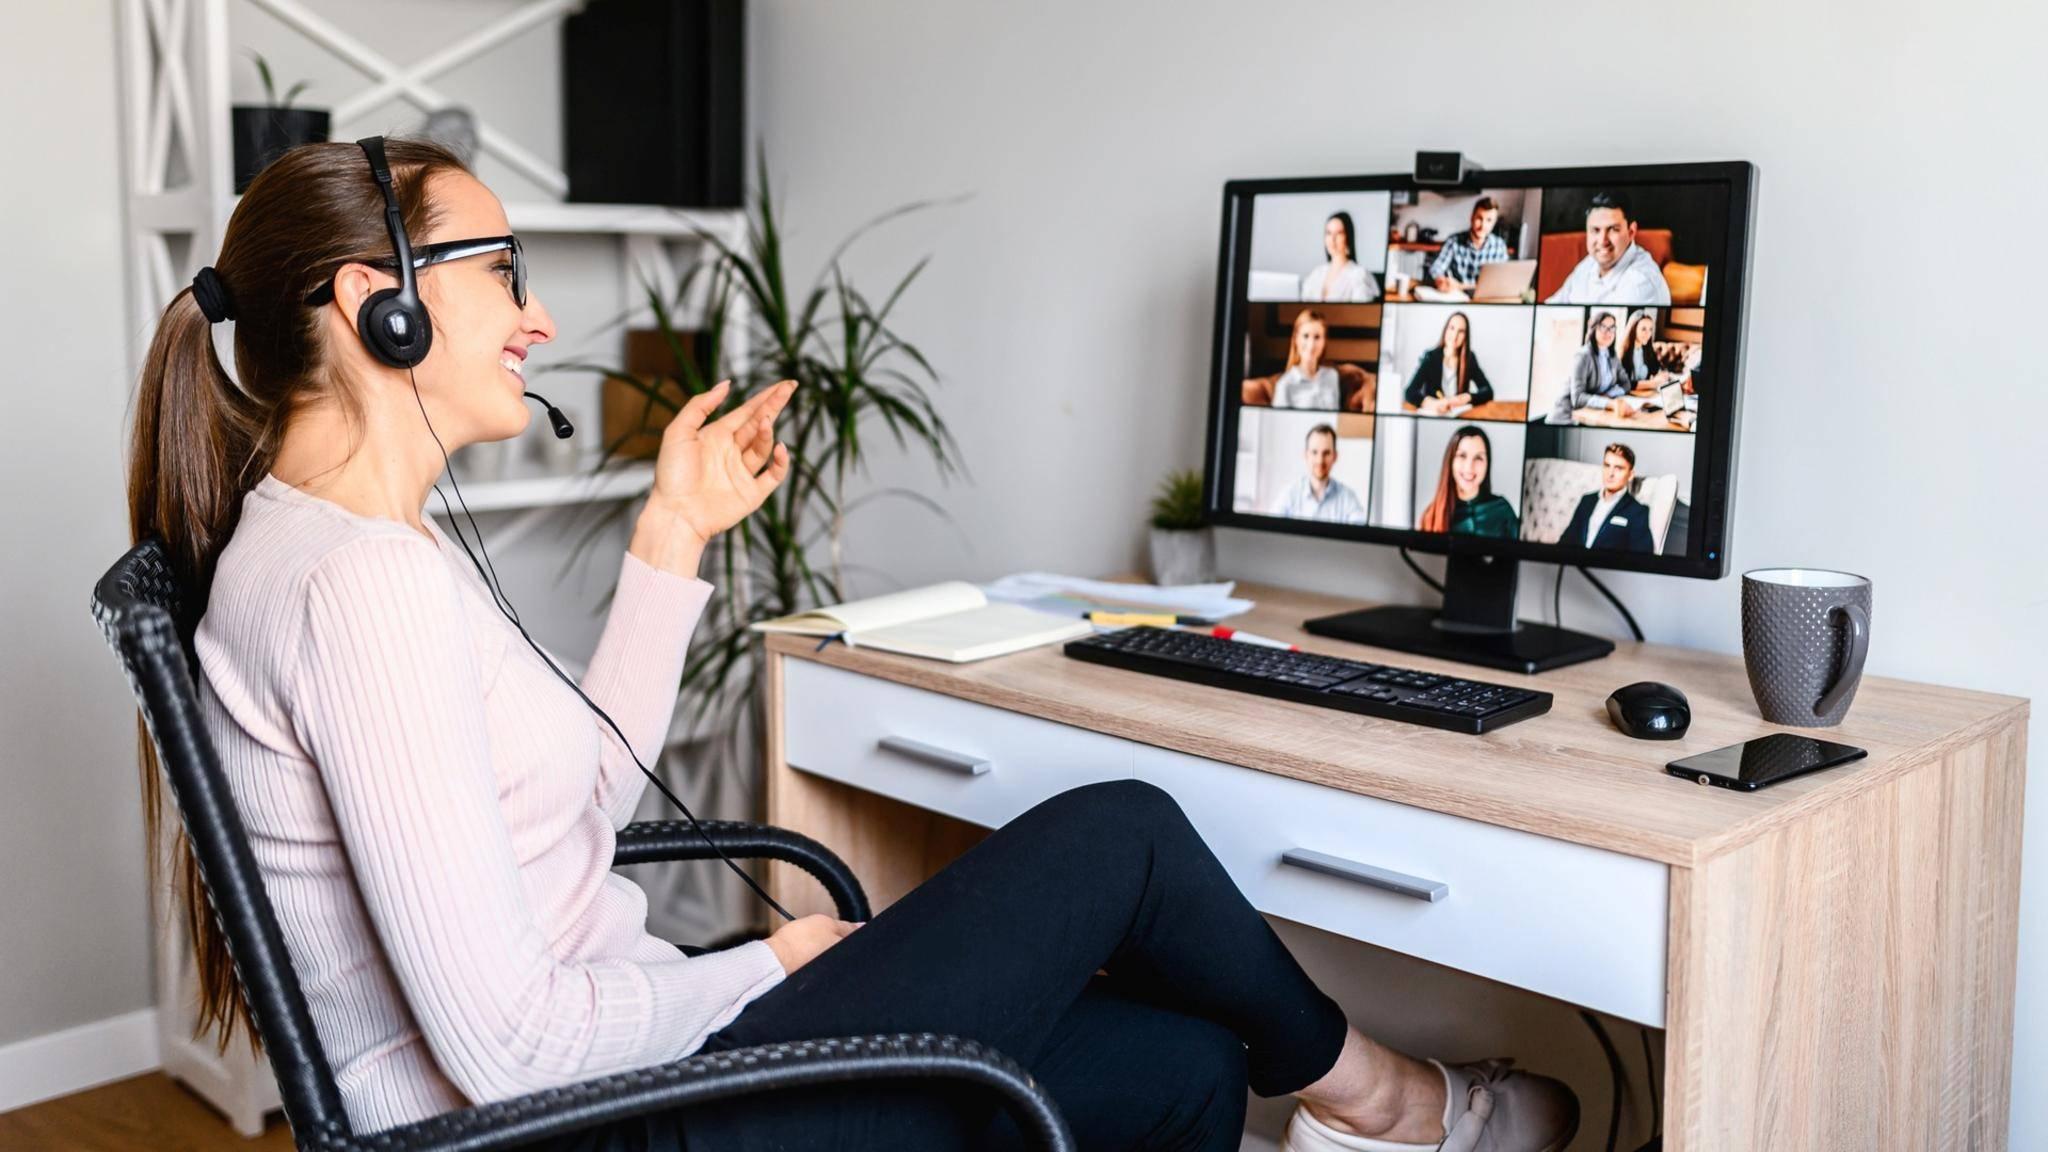 videokonferenz-frau-home-office